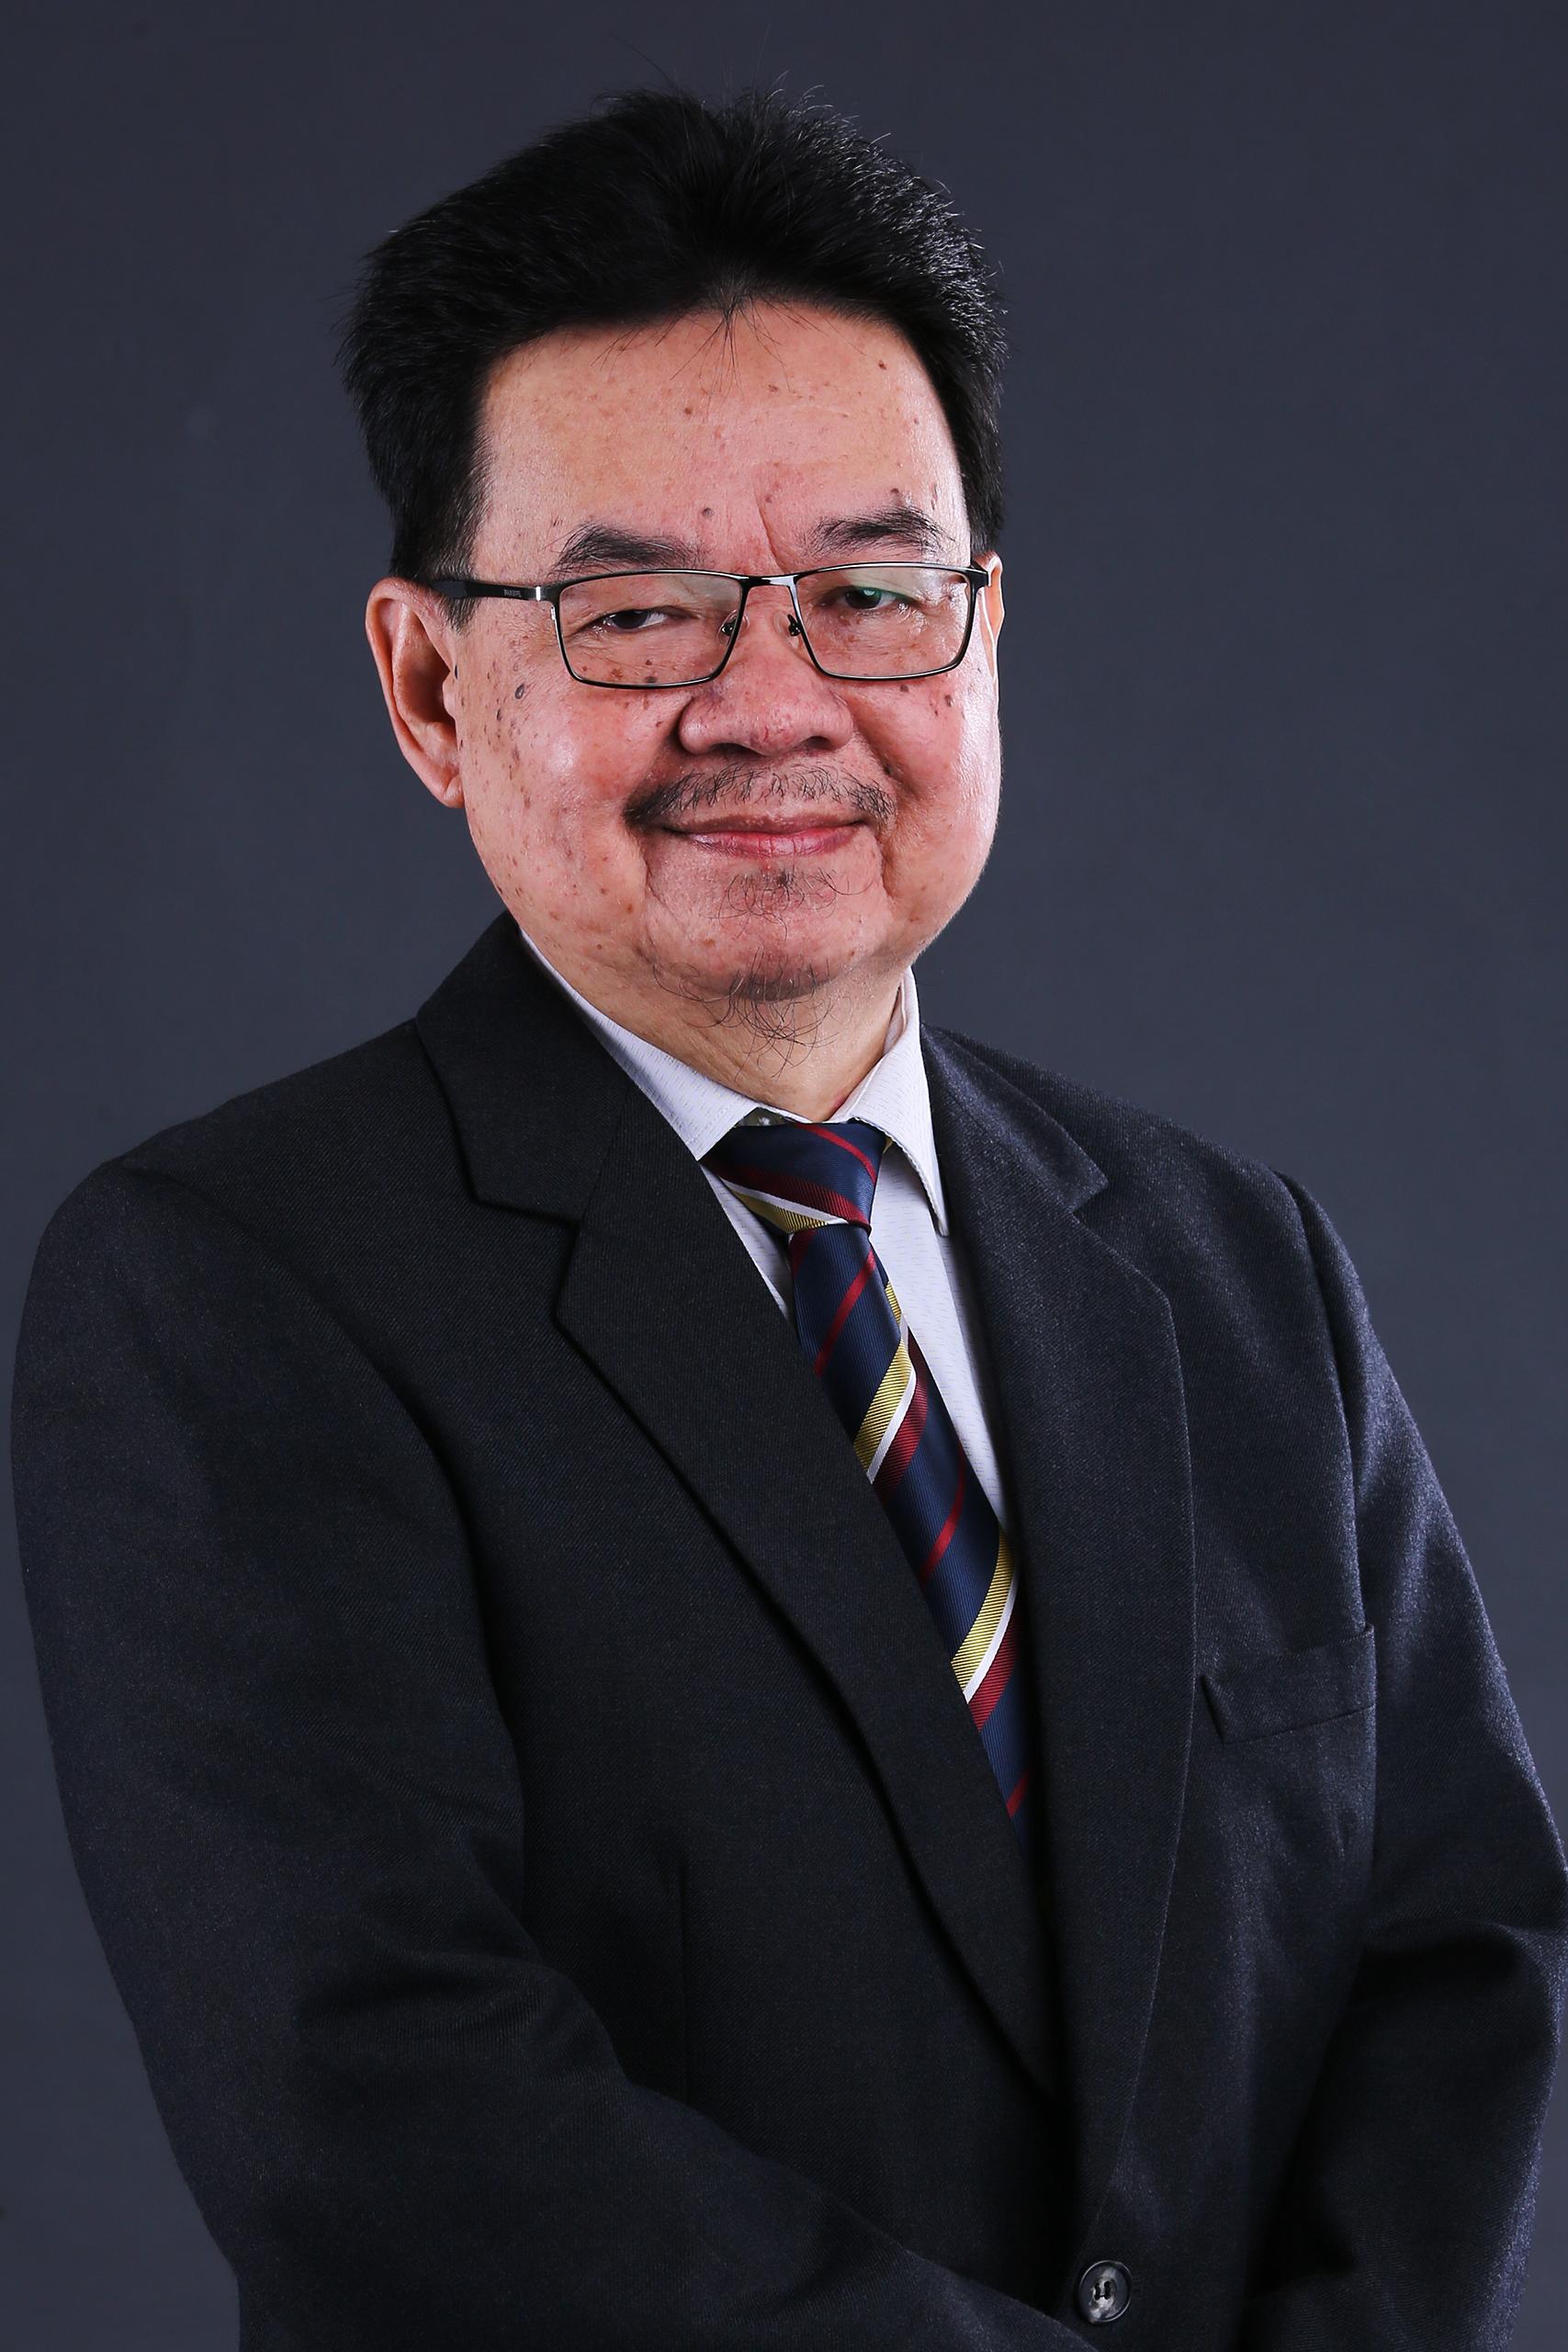 Prof. Sr. Dr. Hishamuddin bin Mohd. Ali